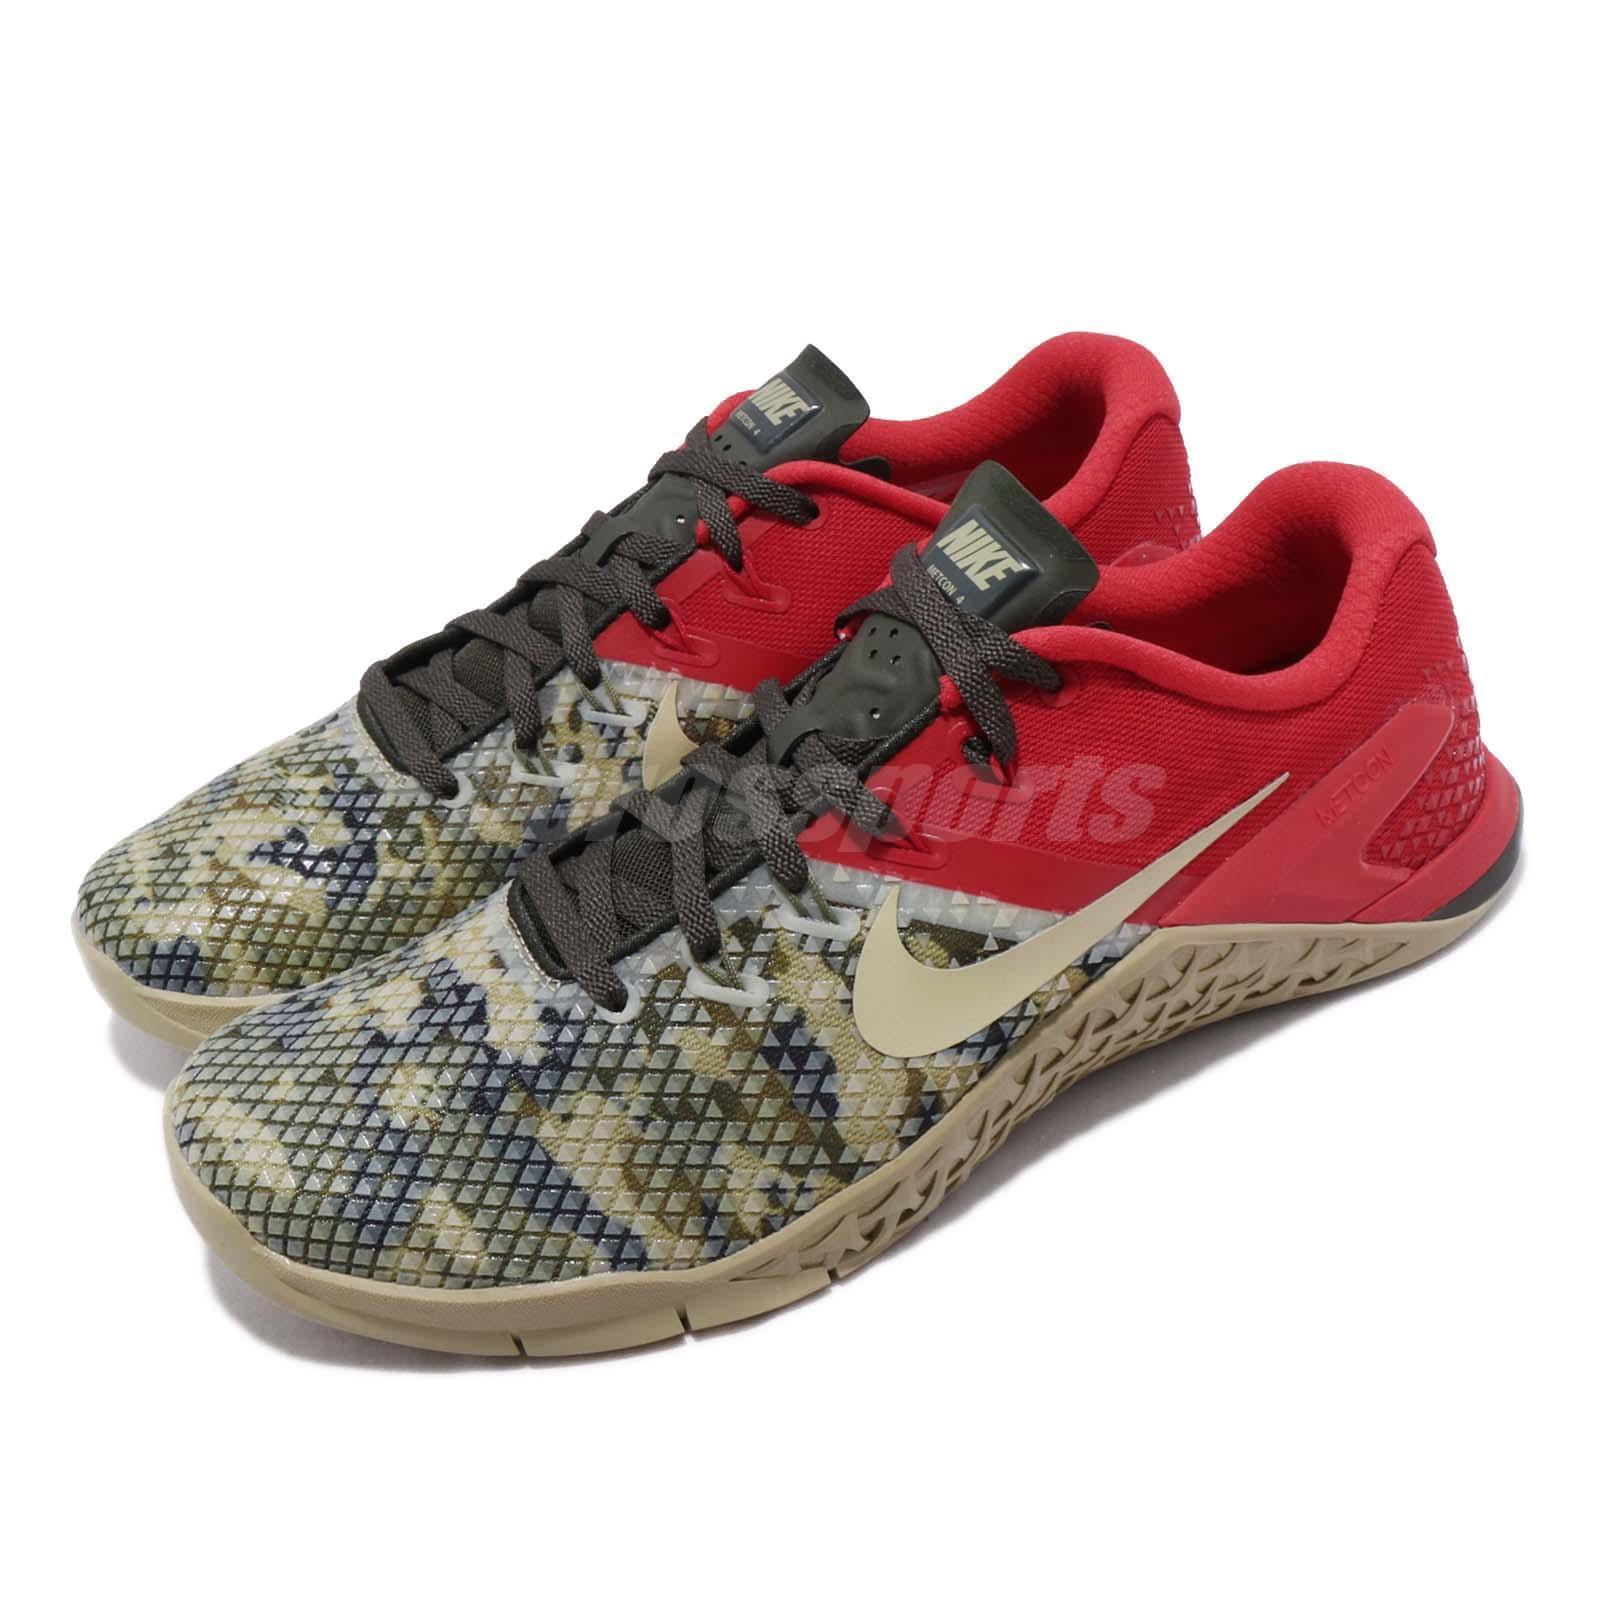 Nike Metcon 4 XD IV Sequoia rojo Camo Men Cross Training zapatos zapatilla de deporte BV1636-301